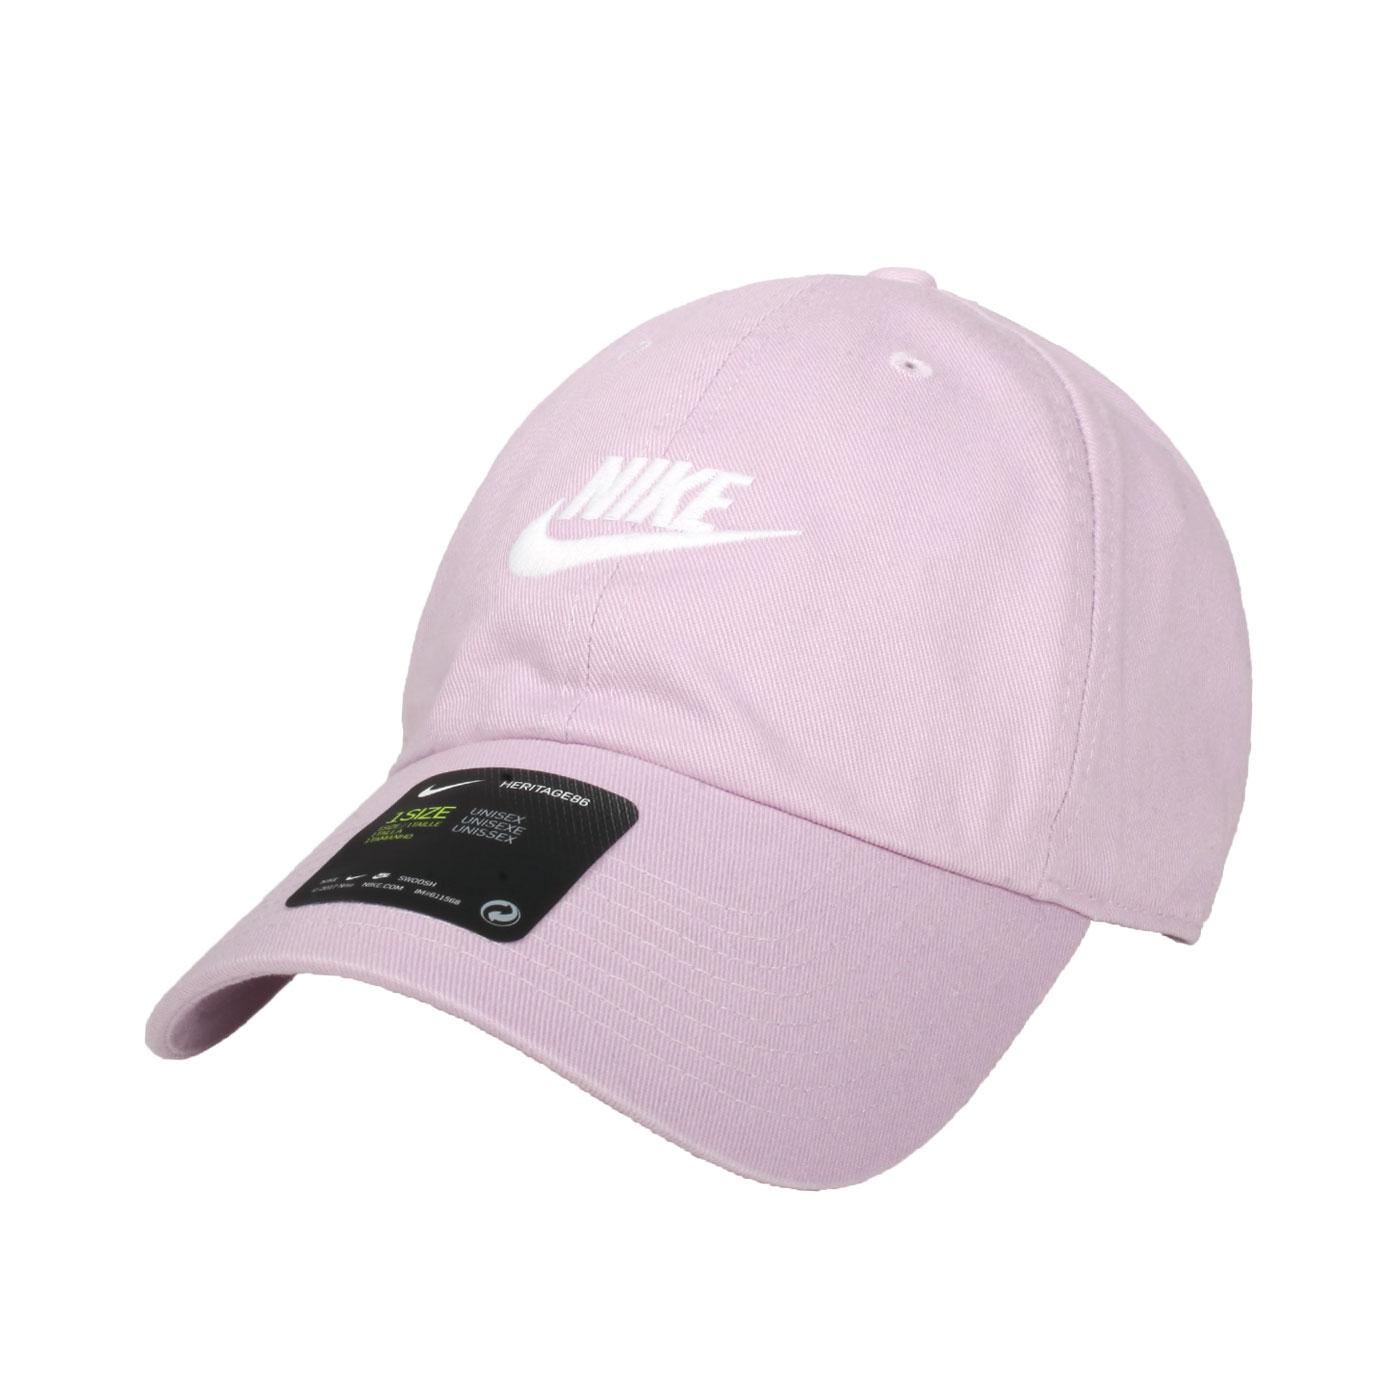 NIKE 棒球帽 913011-576